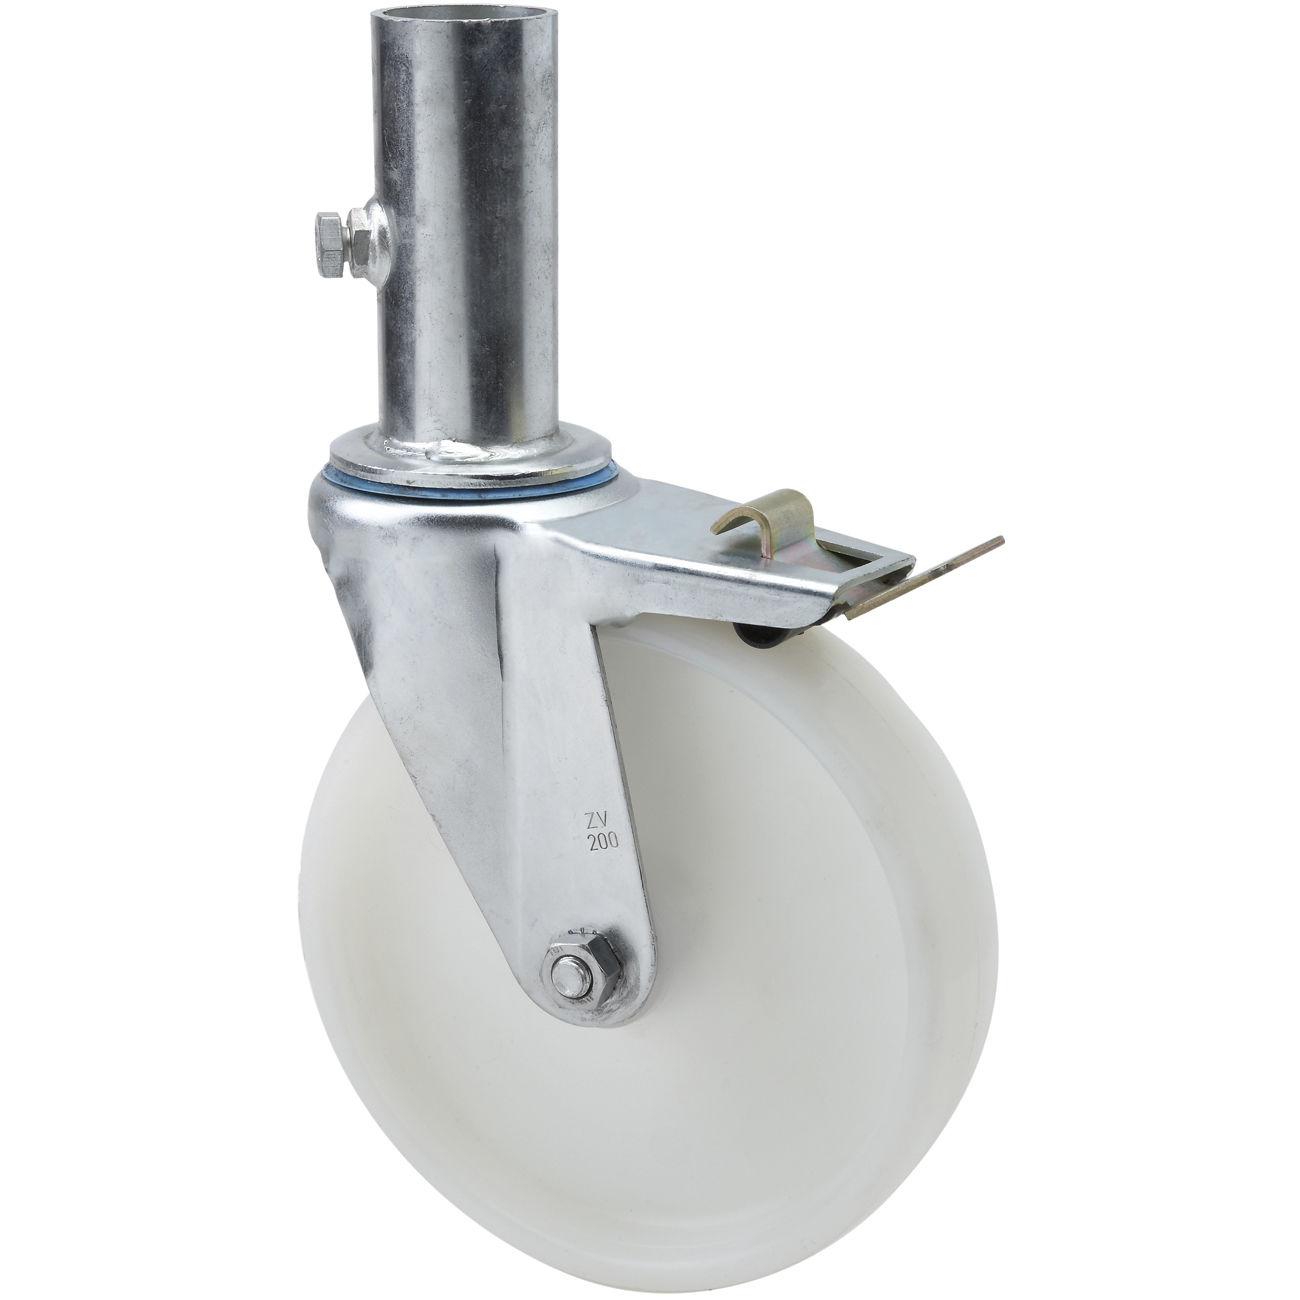 Roda /  caster 6 inch Nylon with Lock